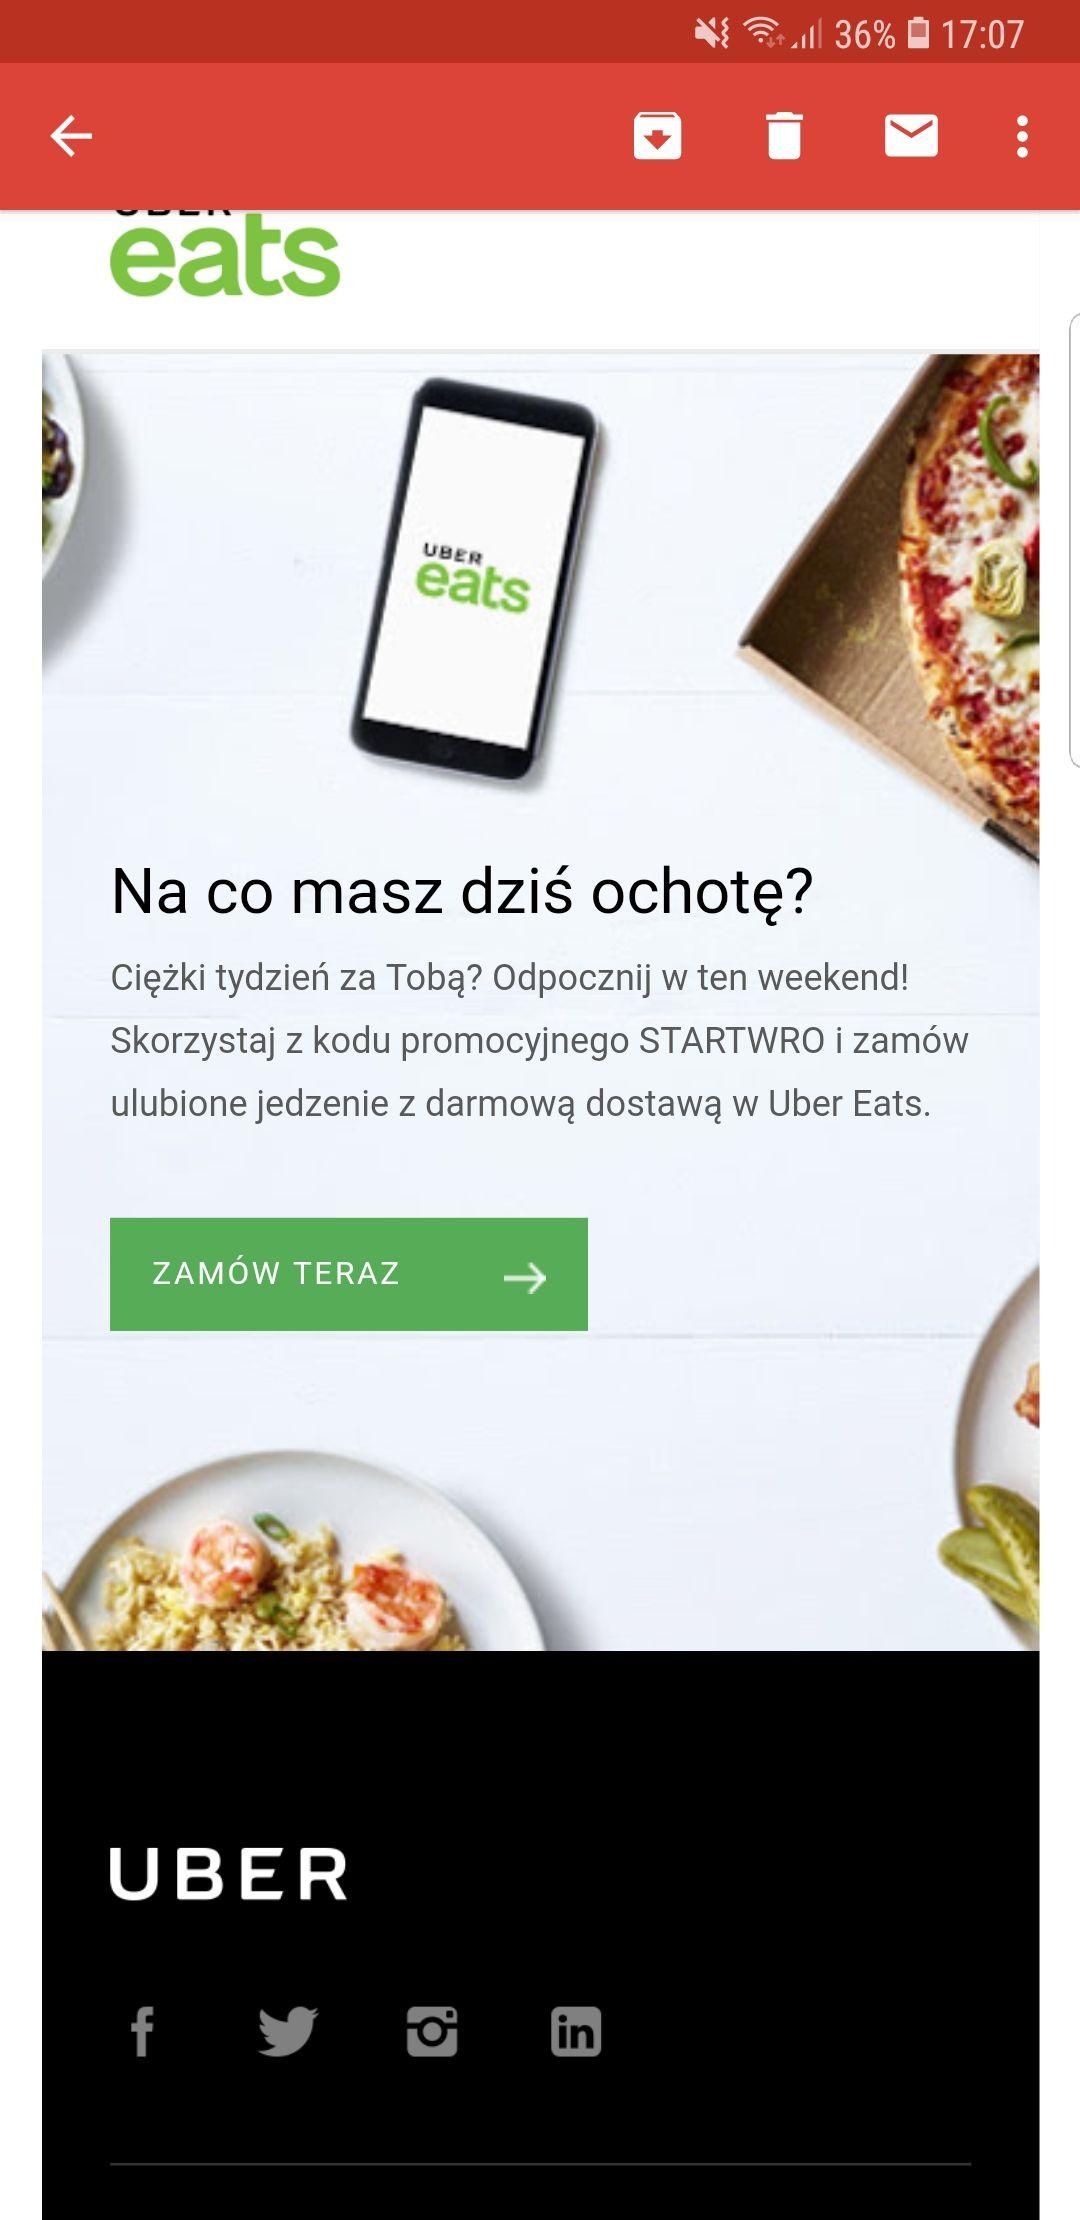 Uber Eats darmowa dostawa we Wrocławiu